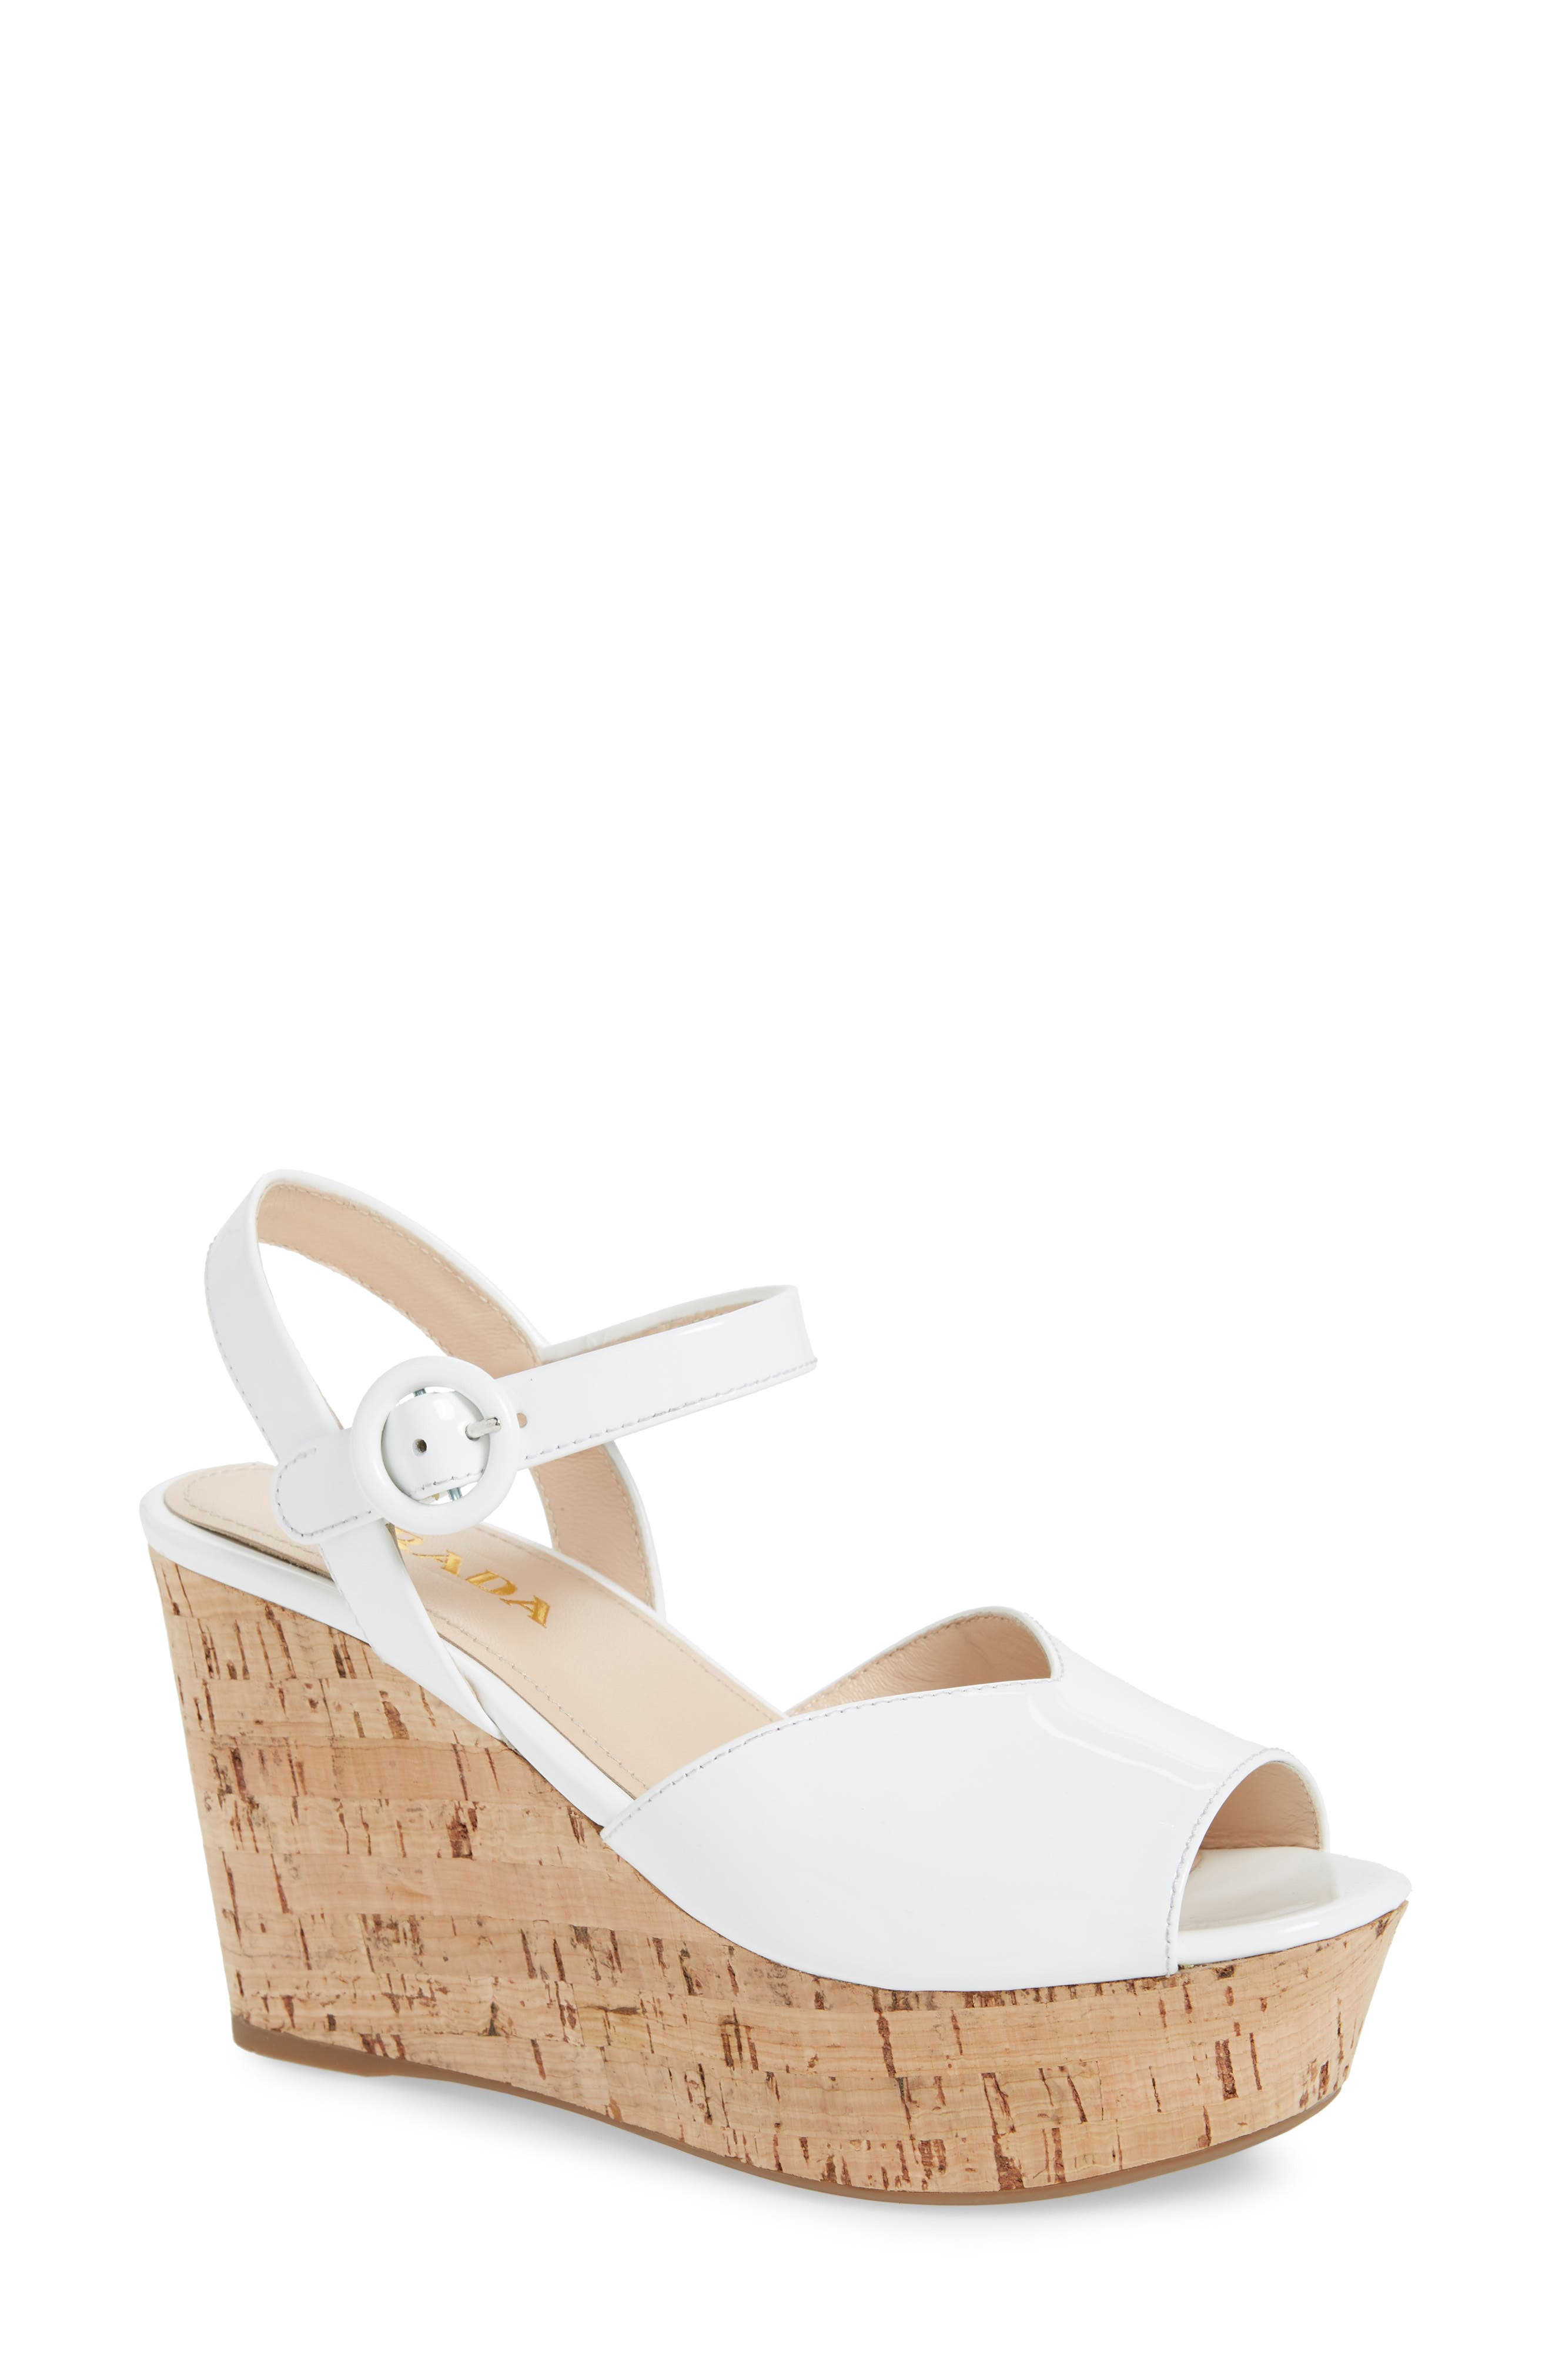 Wedge Platform Sandal,                             Main thumbnail 1, color,                             WHITE PATENT